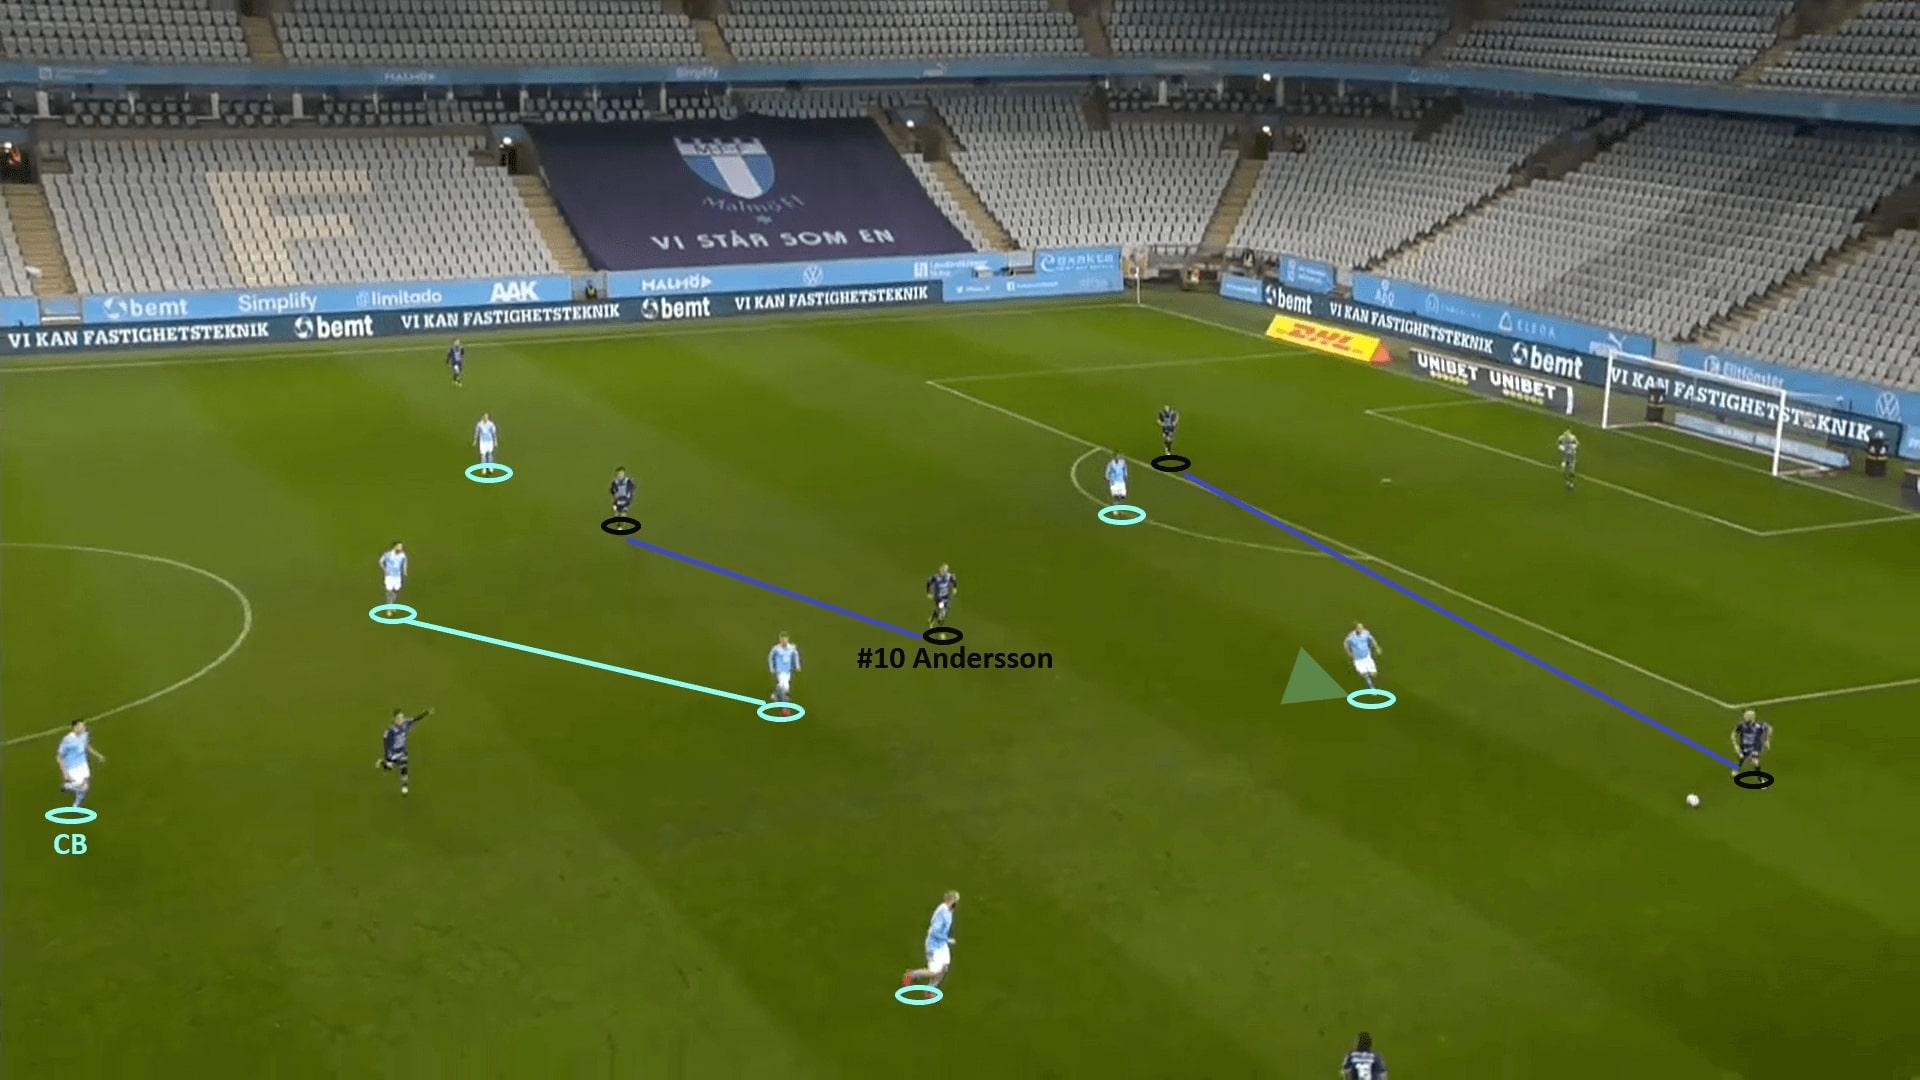 Allsvenskan 2020: Malmo FF vs IK Sirius - tactical analysis - tactics